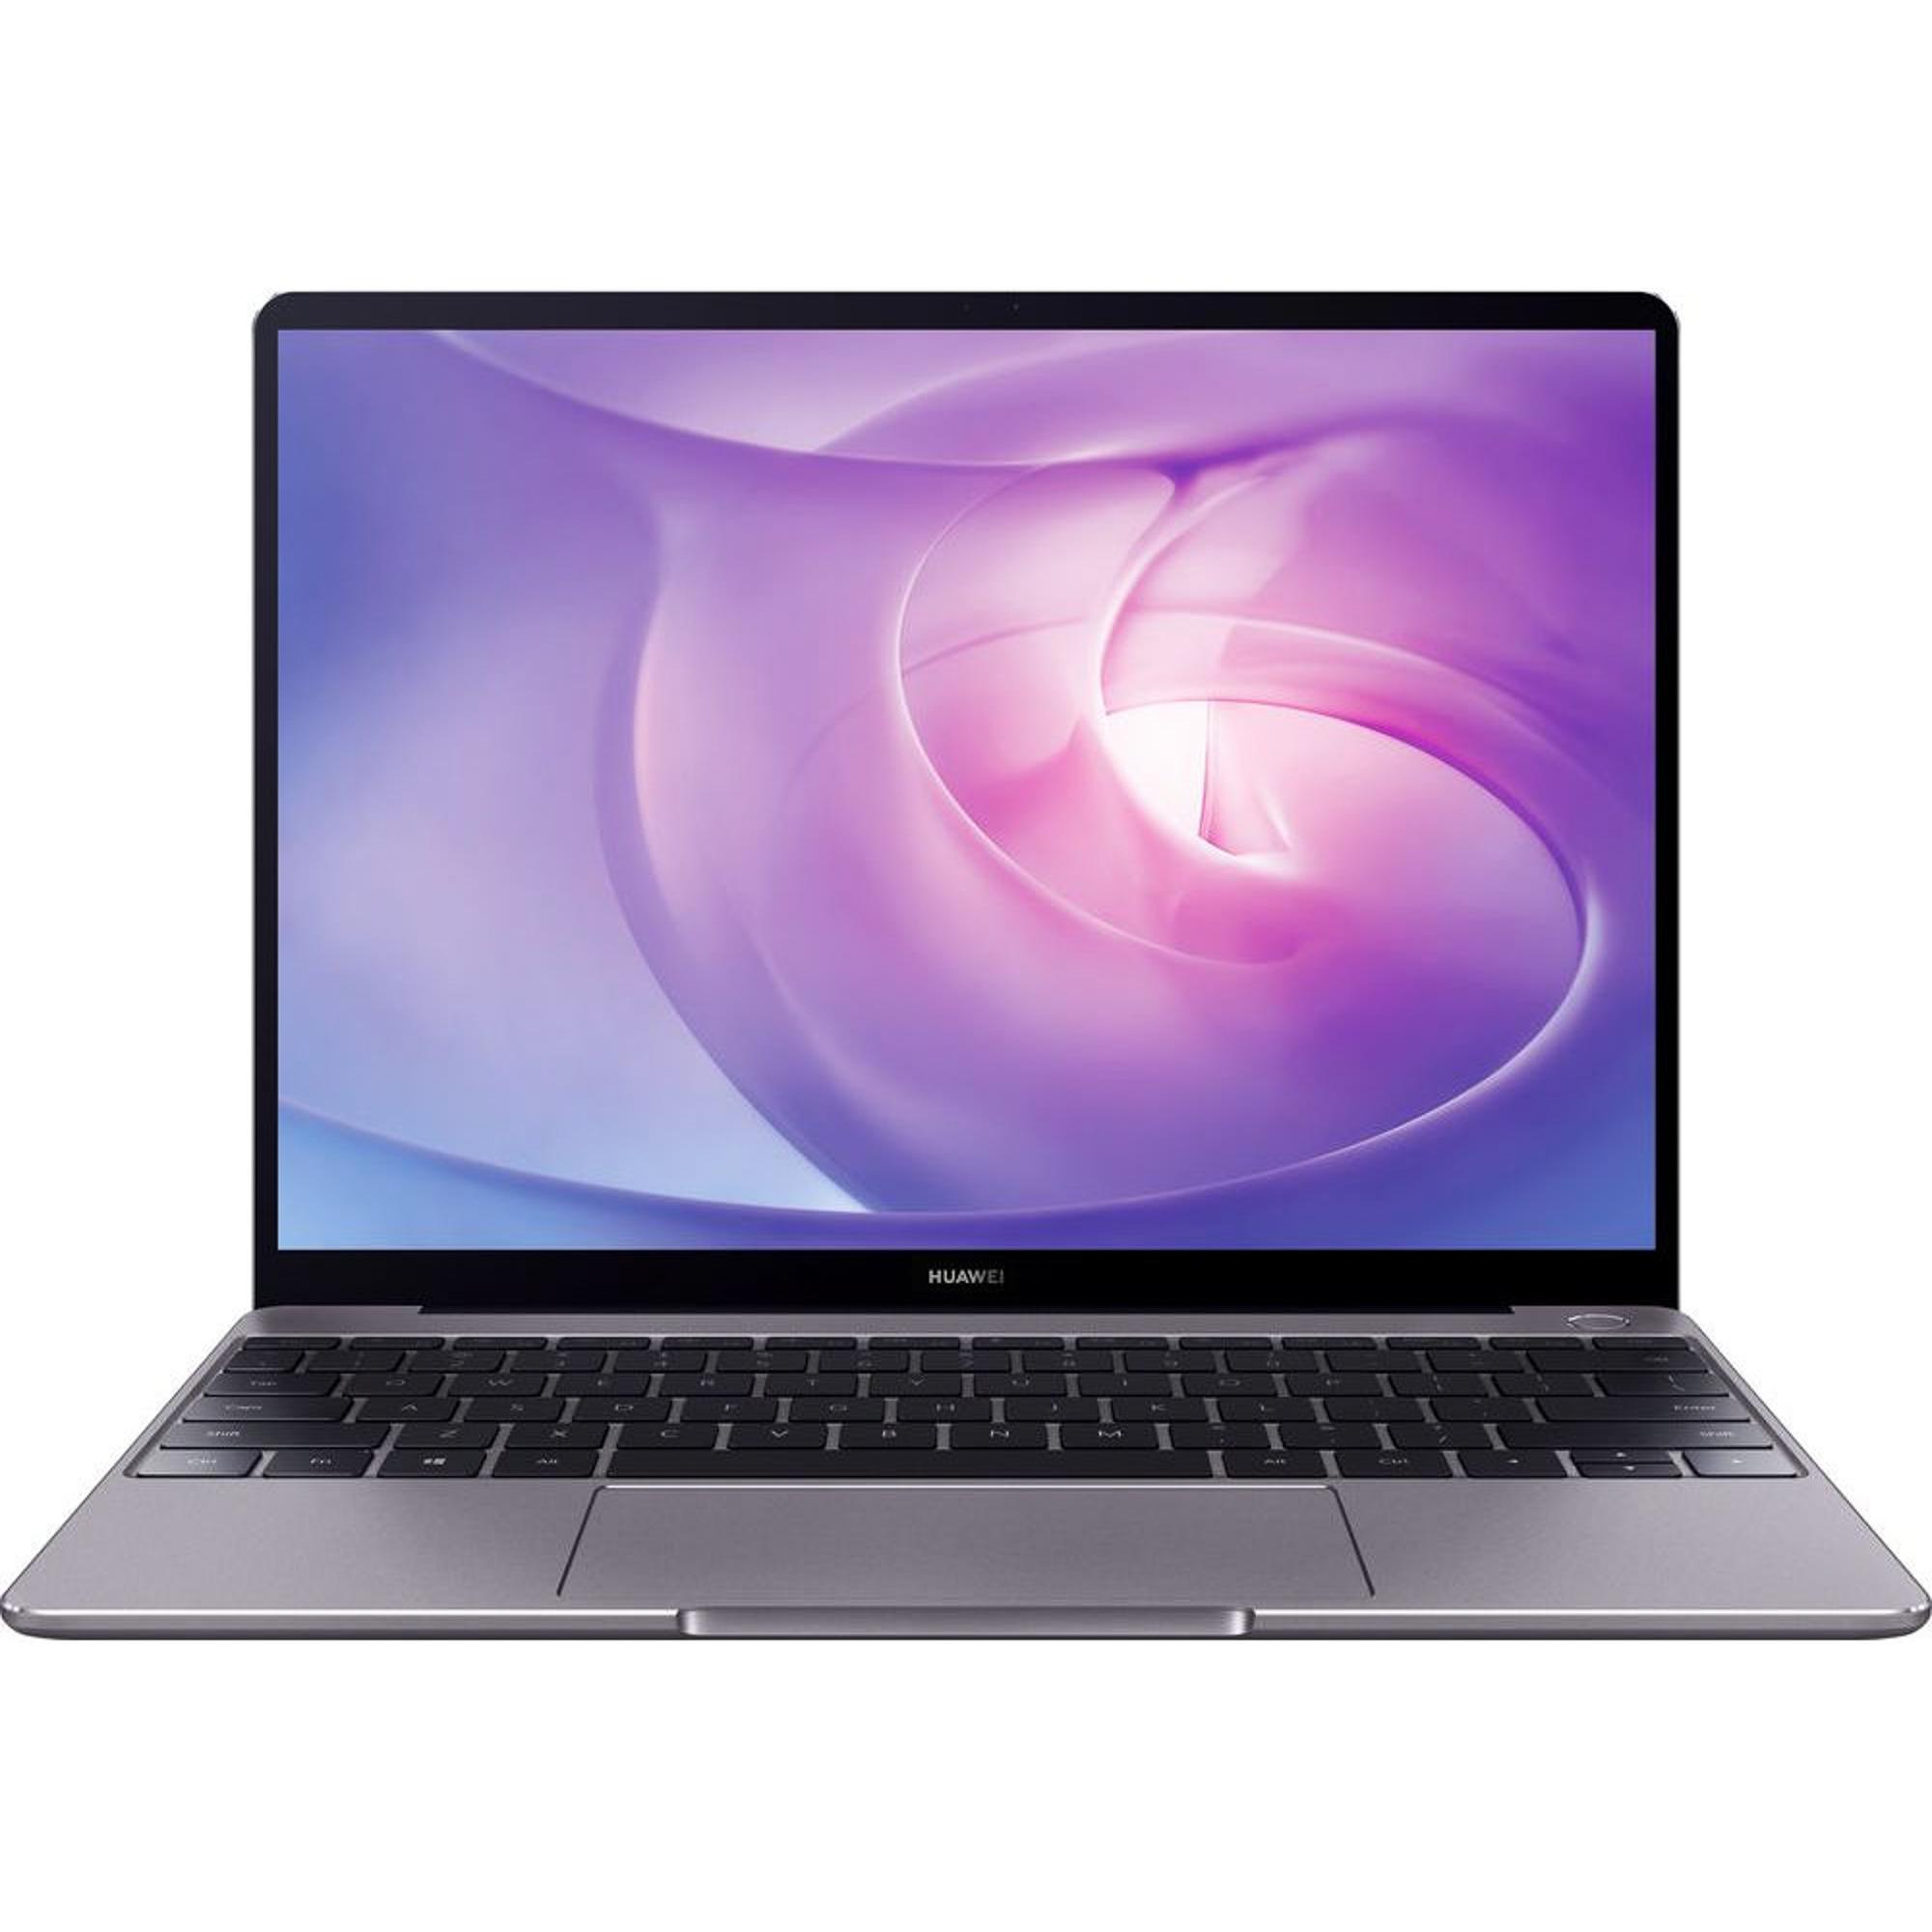 Ультрабук Huawei MateBook 13 WRT-W19 Space Grey